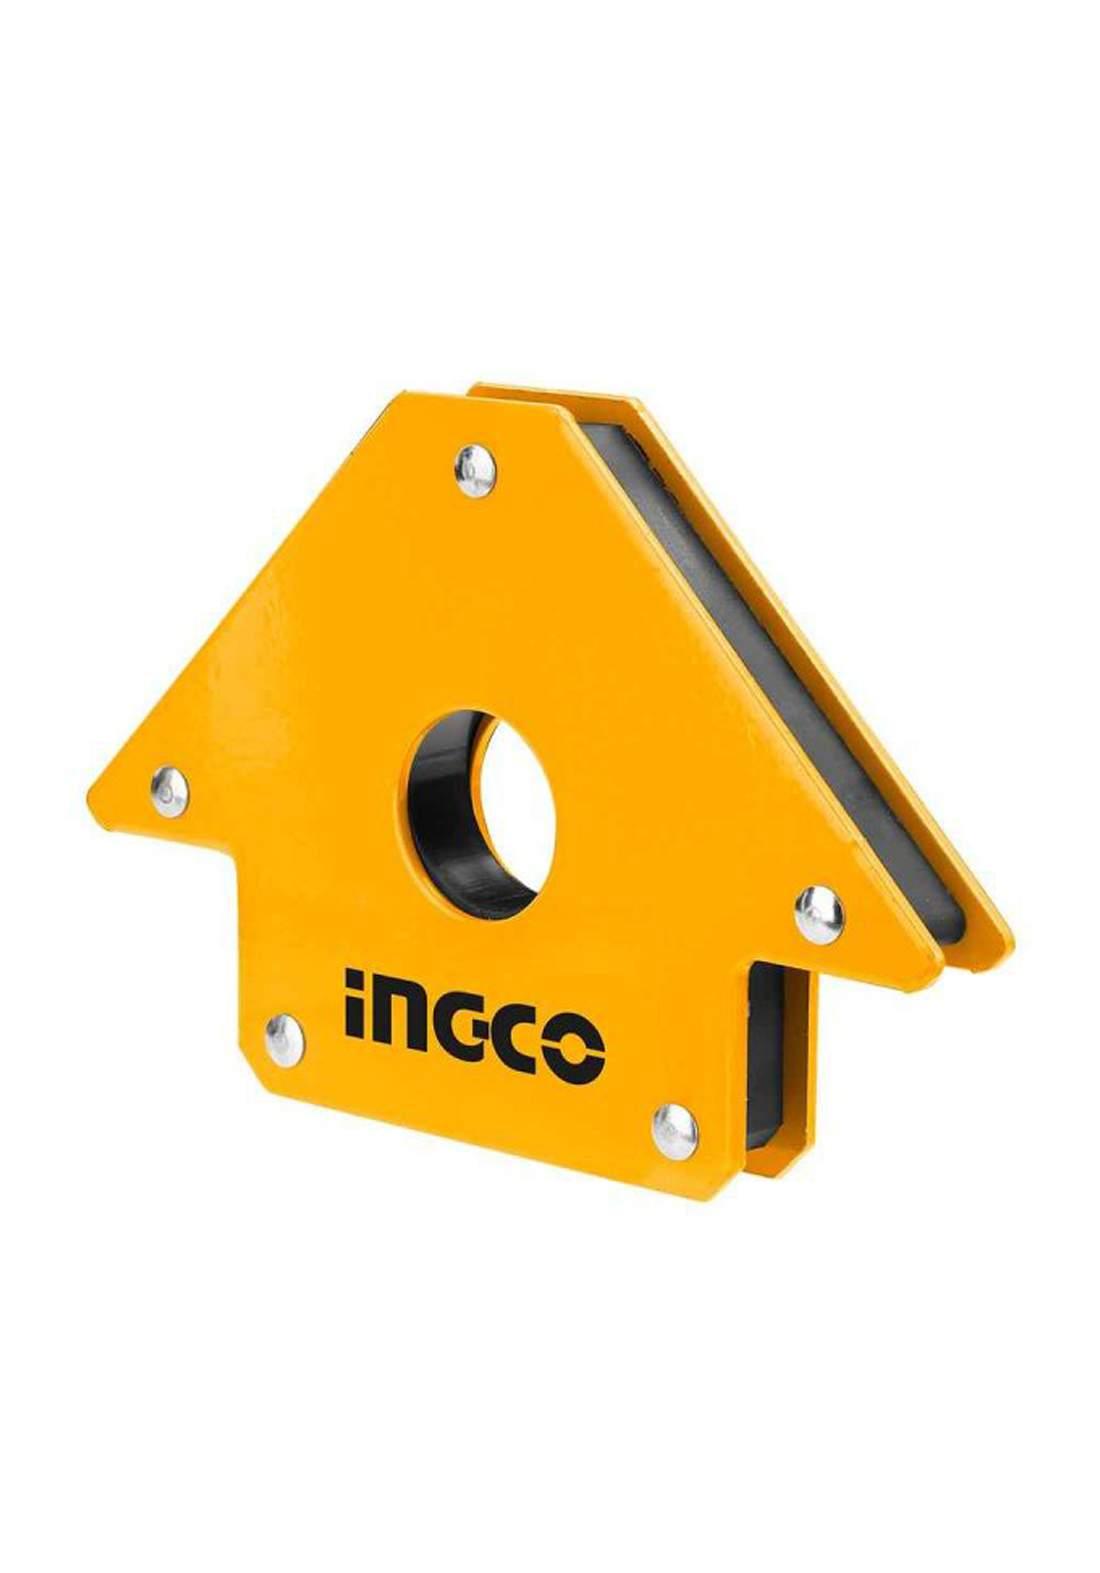 "Ingco AMWH75051 Magnetic Welding Holder 5"" حامل لحام مغناطيسي"